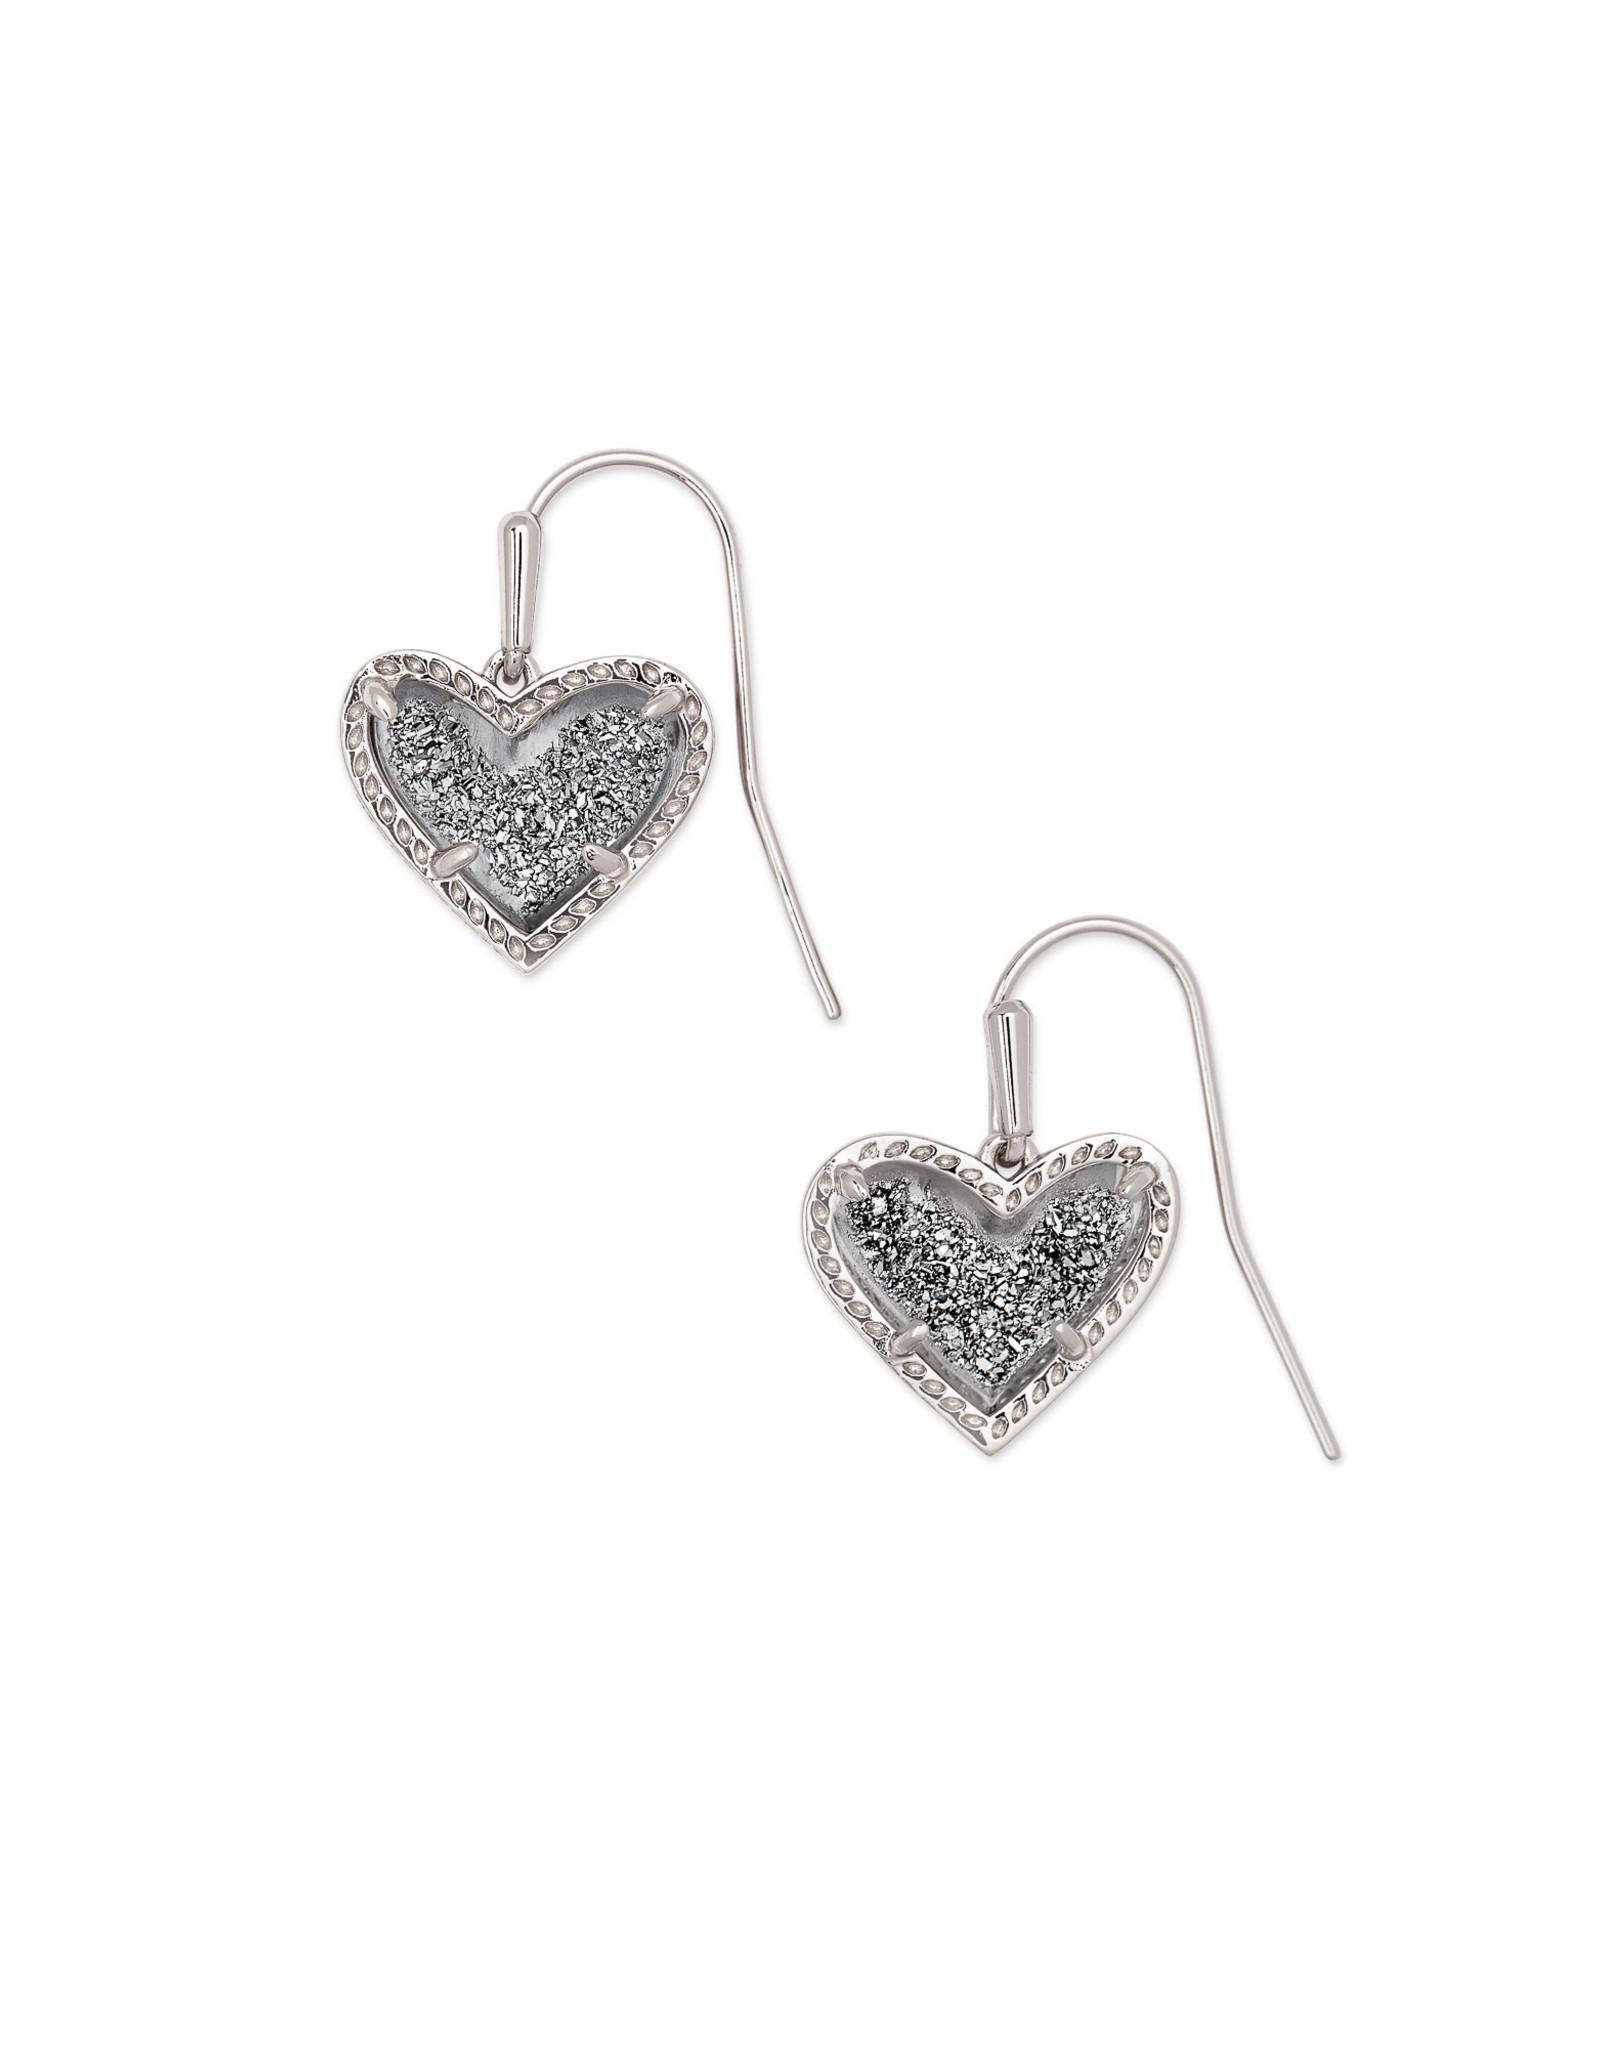 Kendra Scott Ari Heart Drop Earring - Platinum Drusy/Rhodium